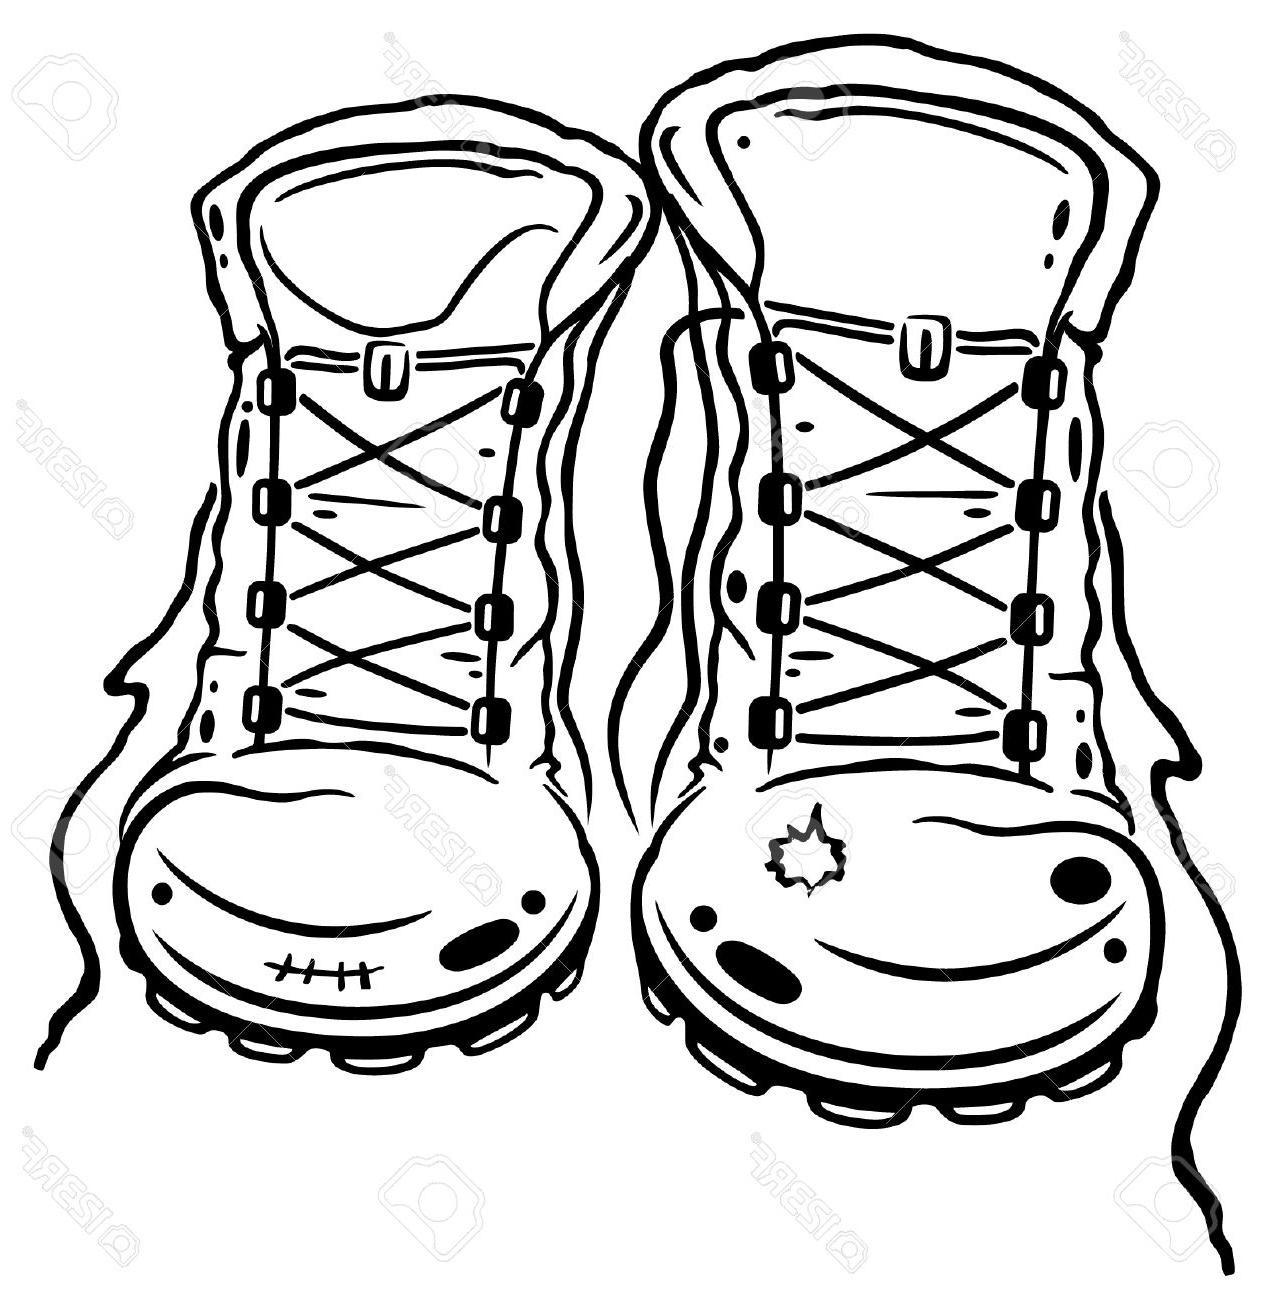 Boot clipart hiking. Drawing at getdrawings com